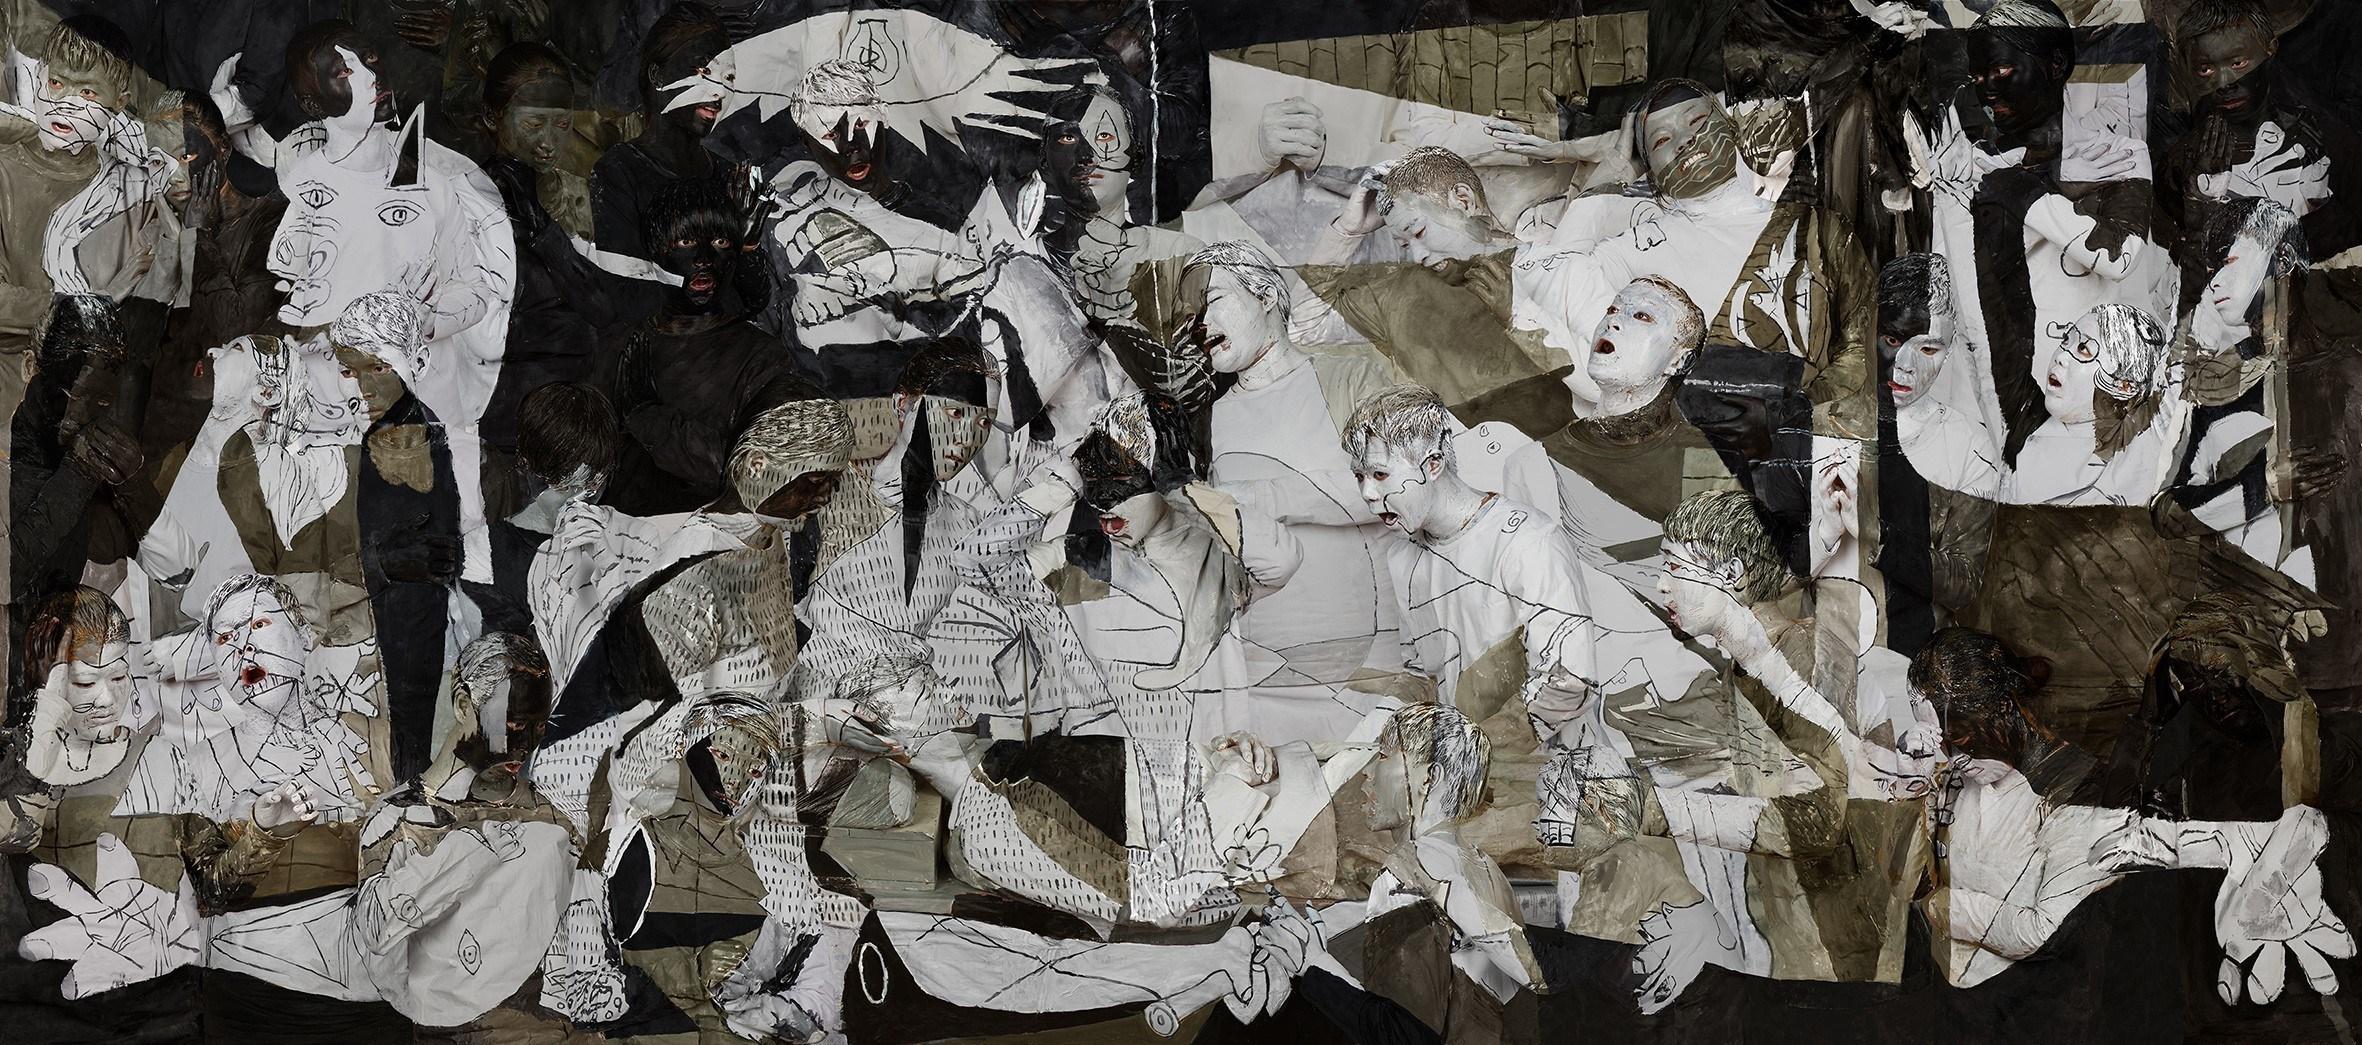 Liu Bolin, Guernica, 2016 (PRNewsFoto/Klein Sun Gallery)